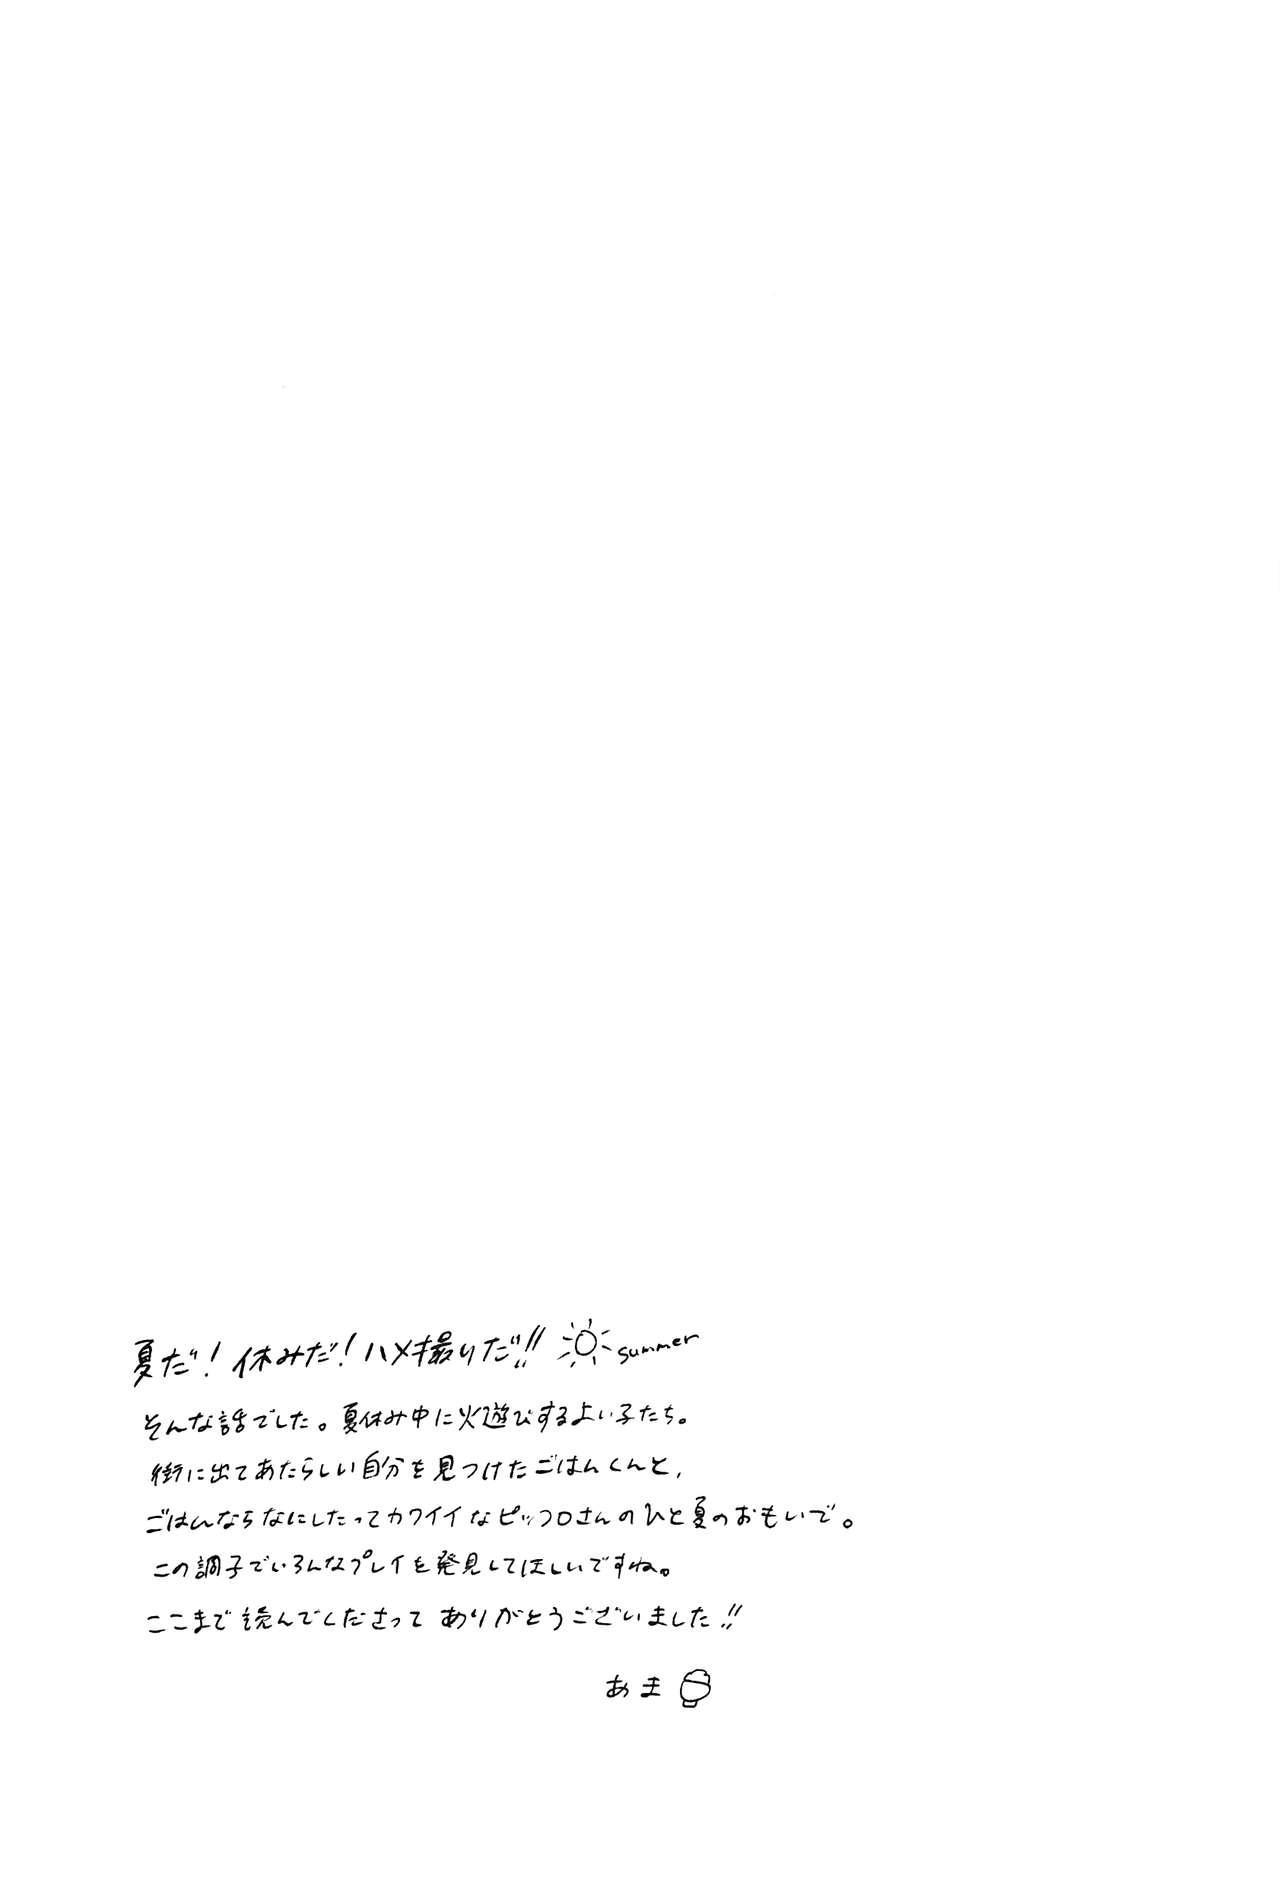 Odorokubeki Zanzou - WONDER BLUR 31